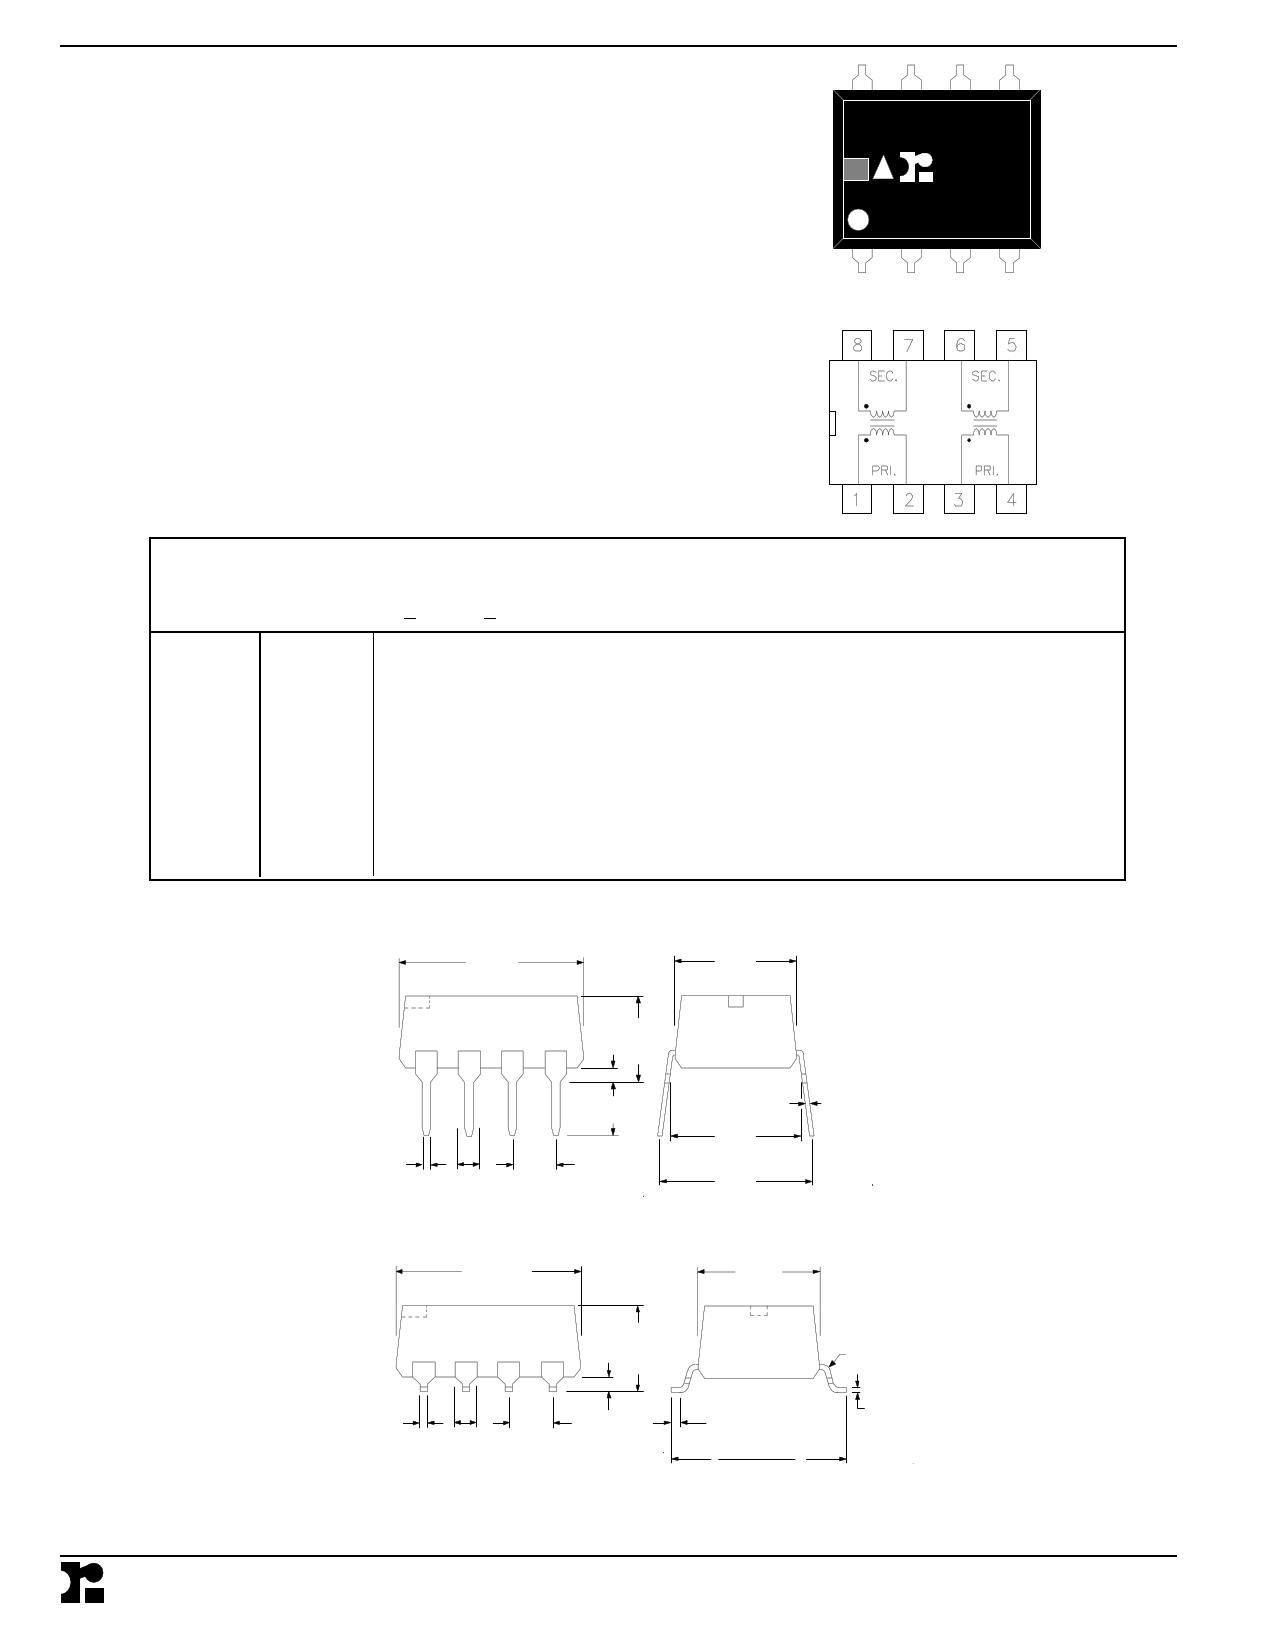 T-11300 datasheet